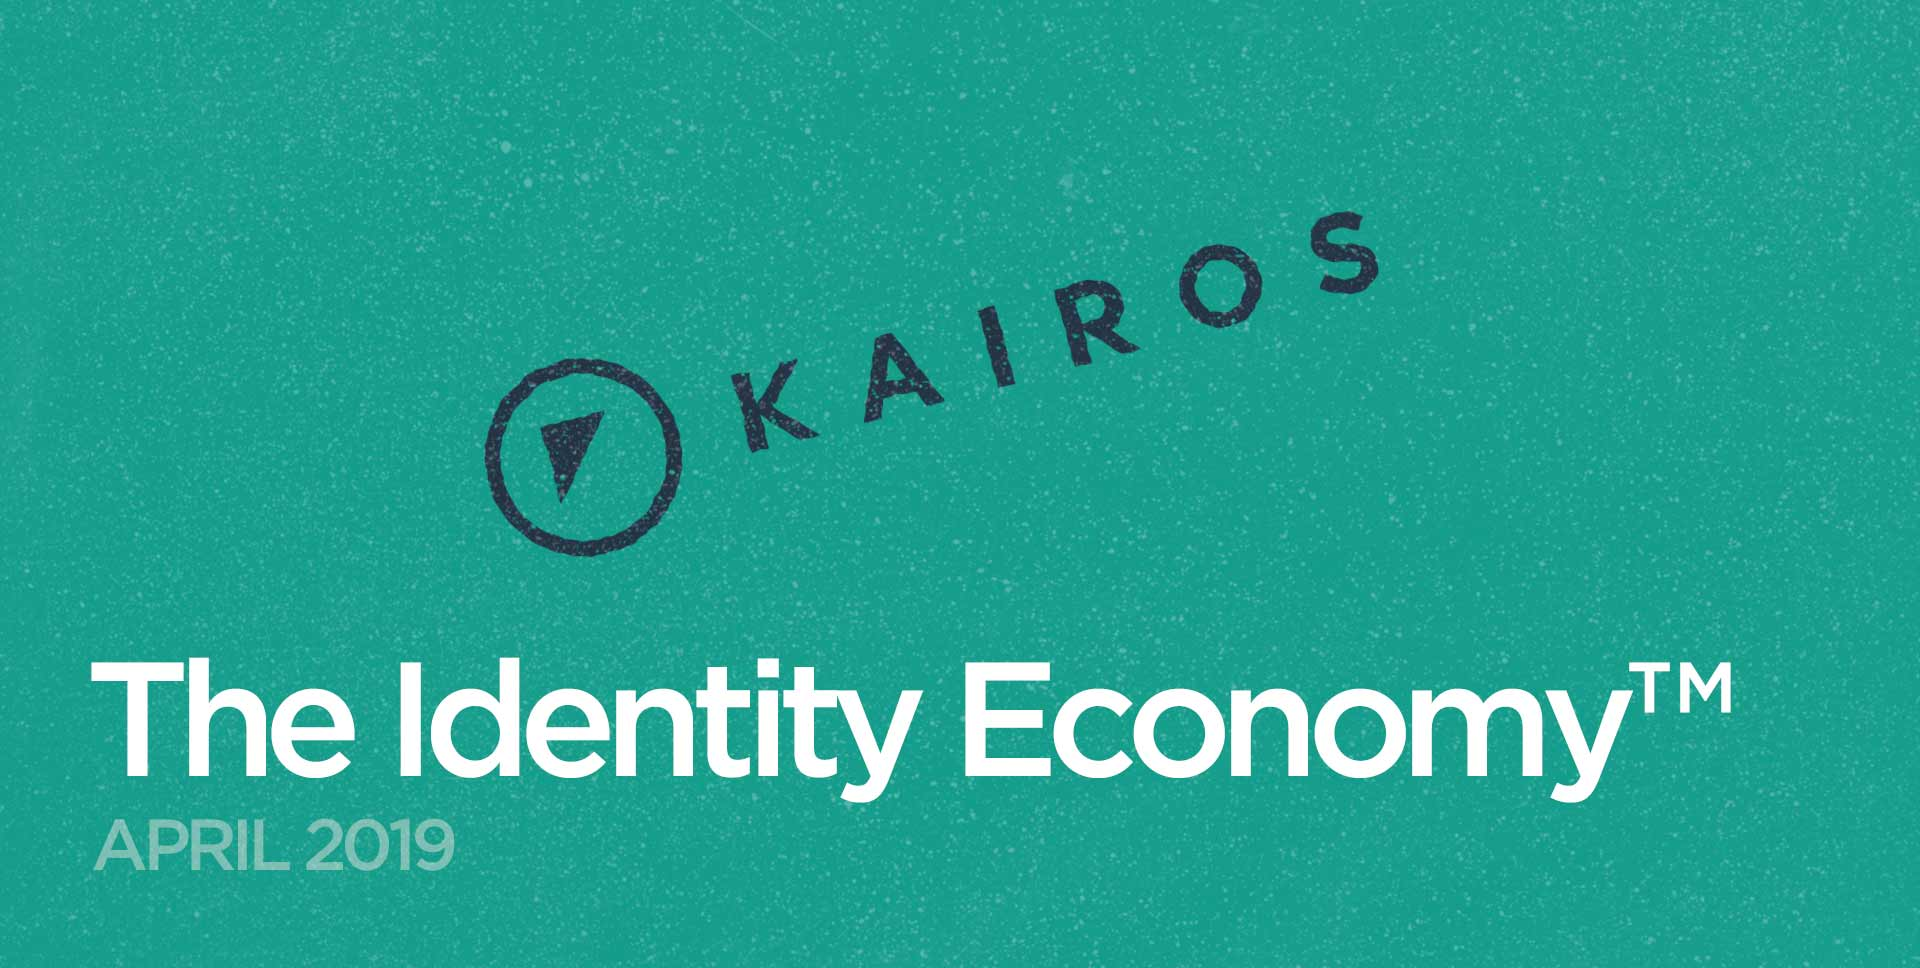 Kairos presents The Identity Economy™